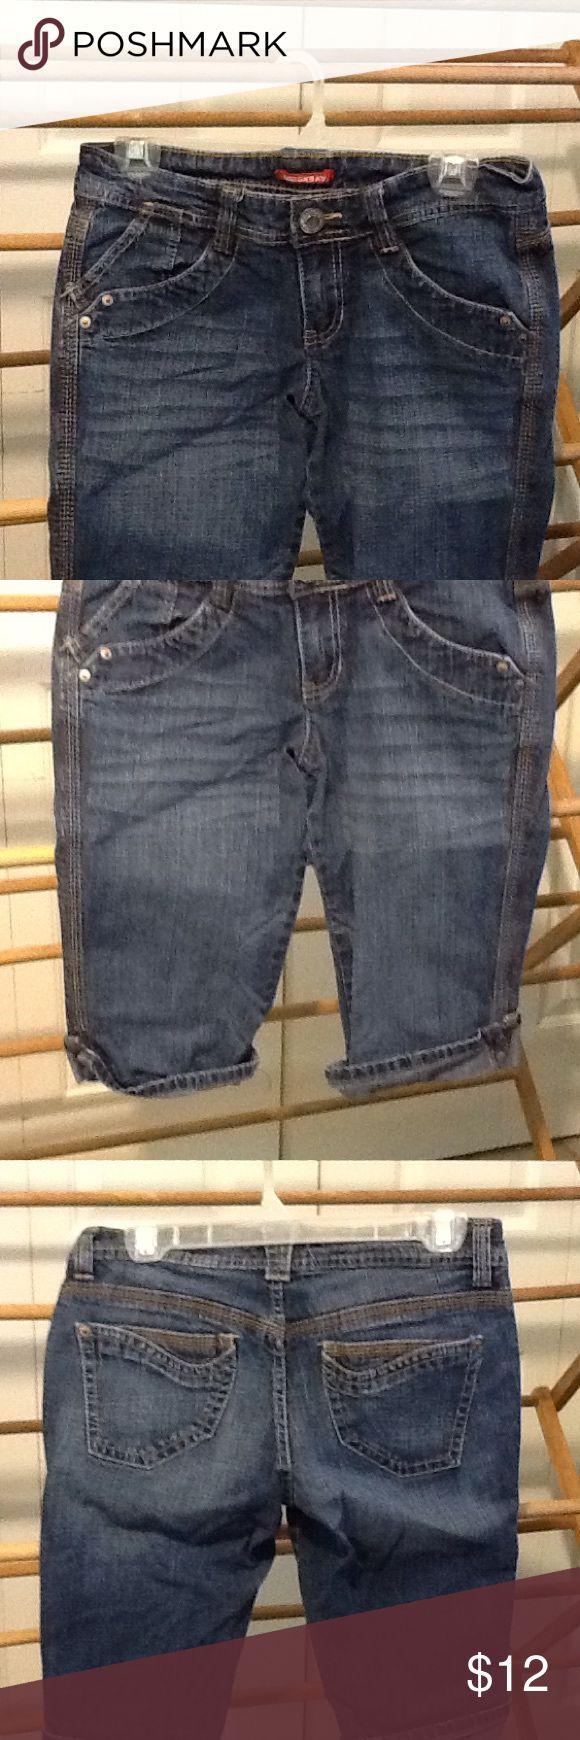 Union Bay Size 7 Juniors Shorts Denim Jeans Cotton and spandex size 7 denim Jean shorts Union Bay. Great condition. Low waist. Union Bay Shorts Jean Shorts